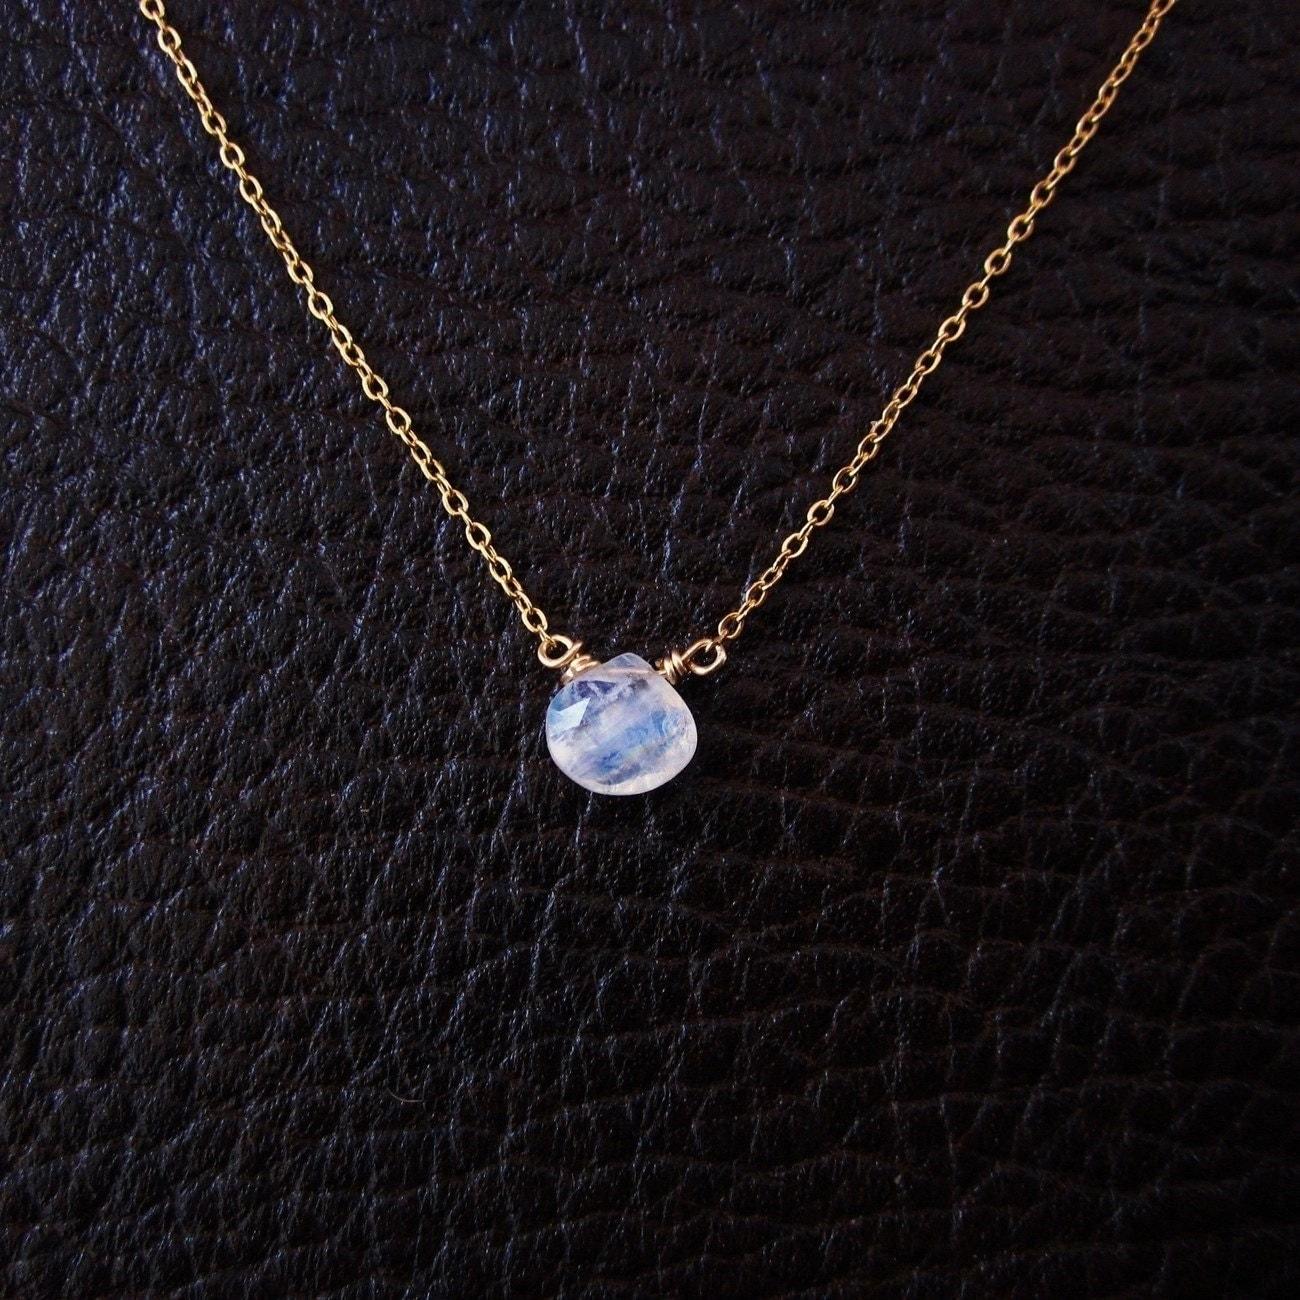 Moonstone Necklace Moonstone Pendant Charm Necklace